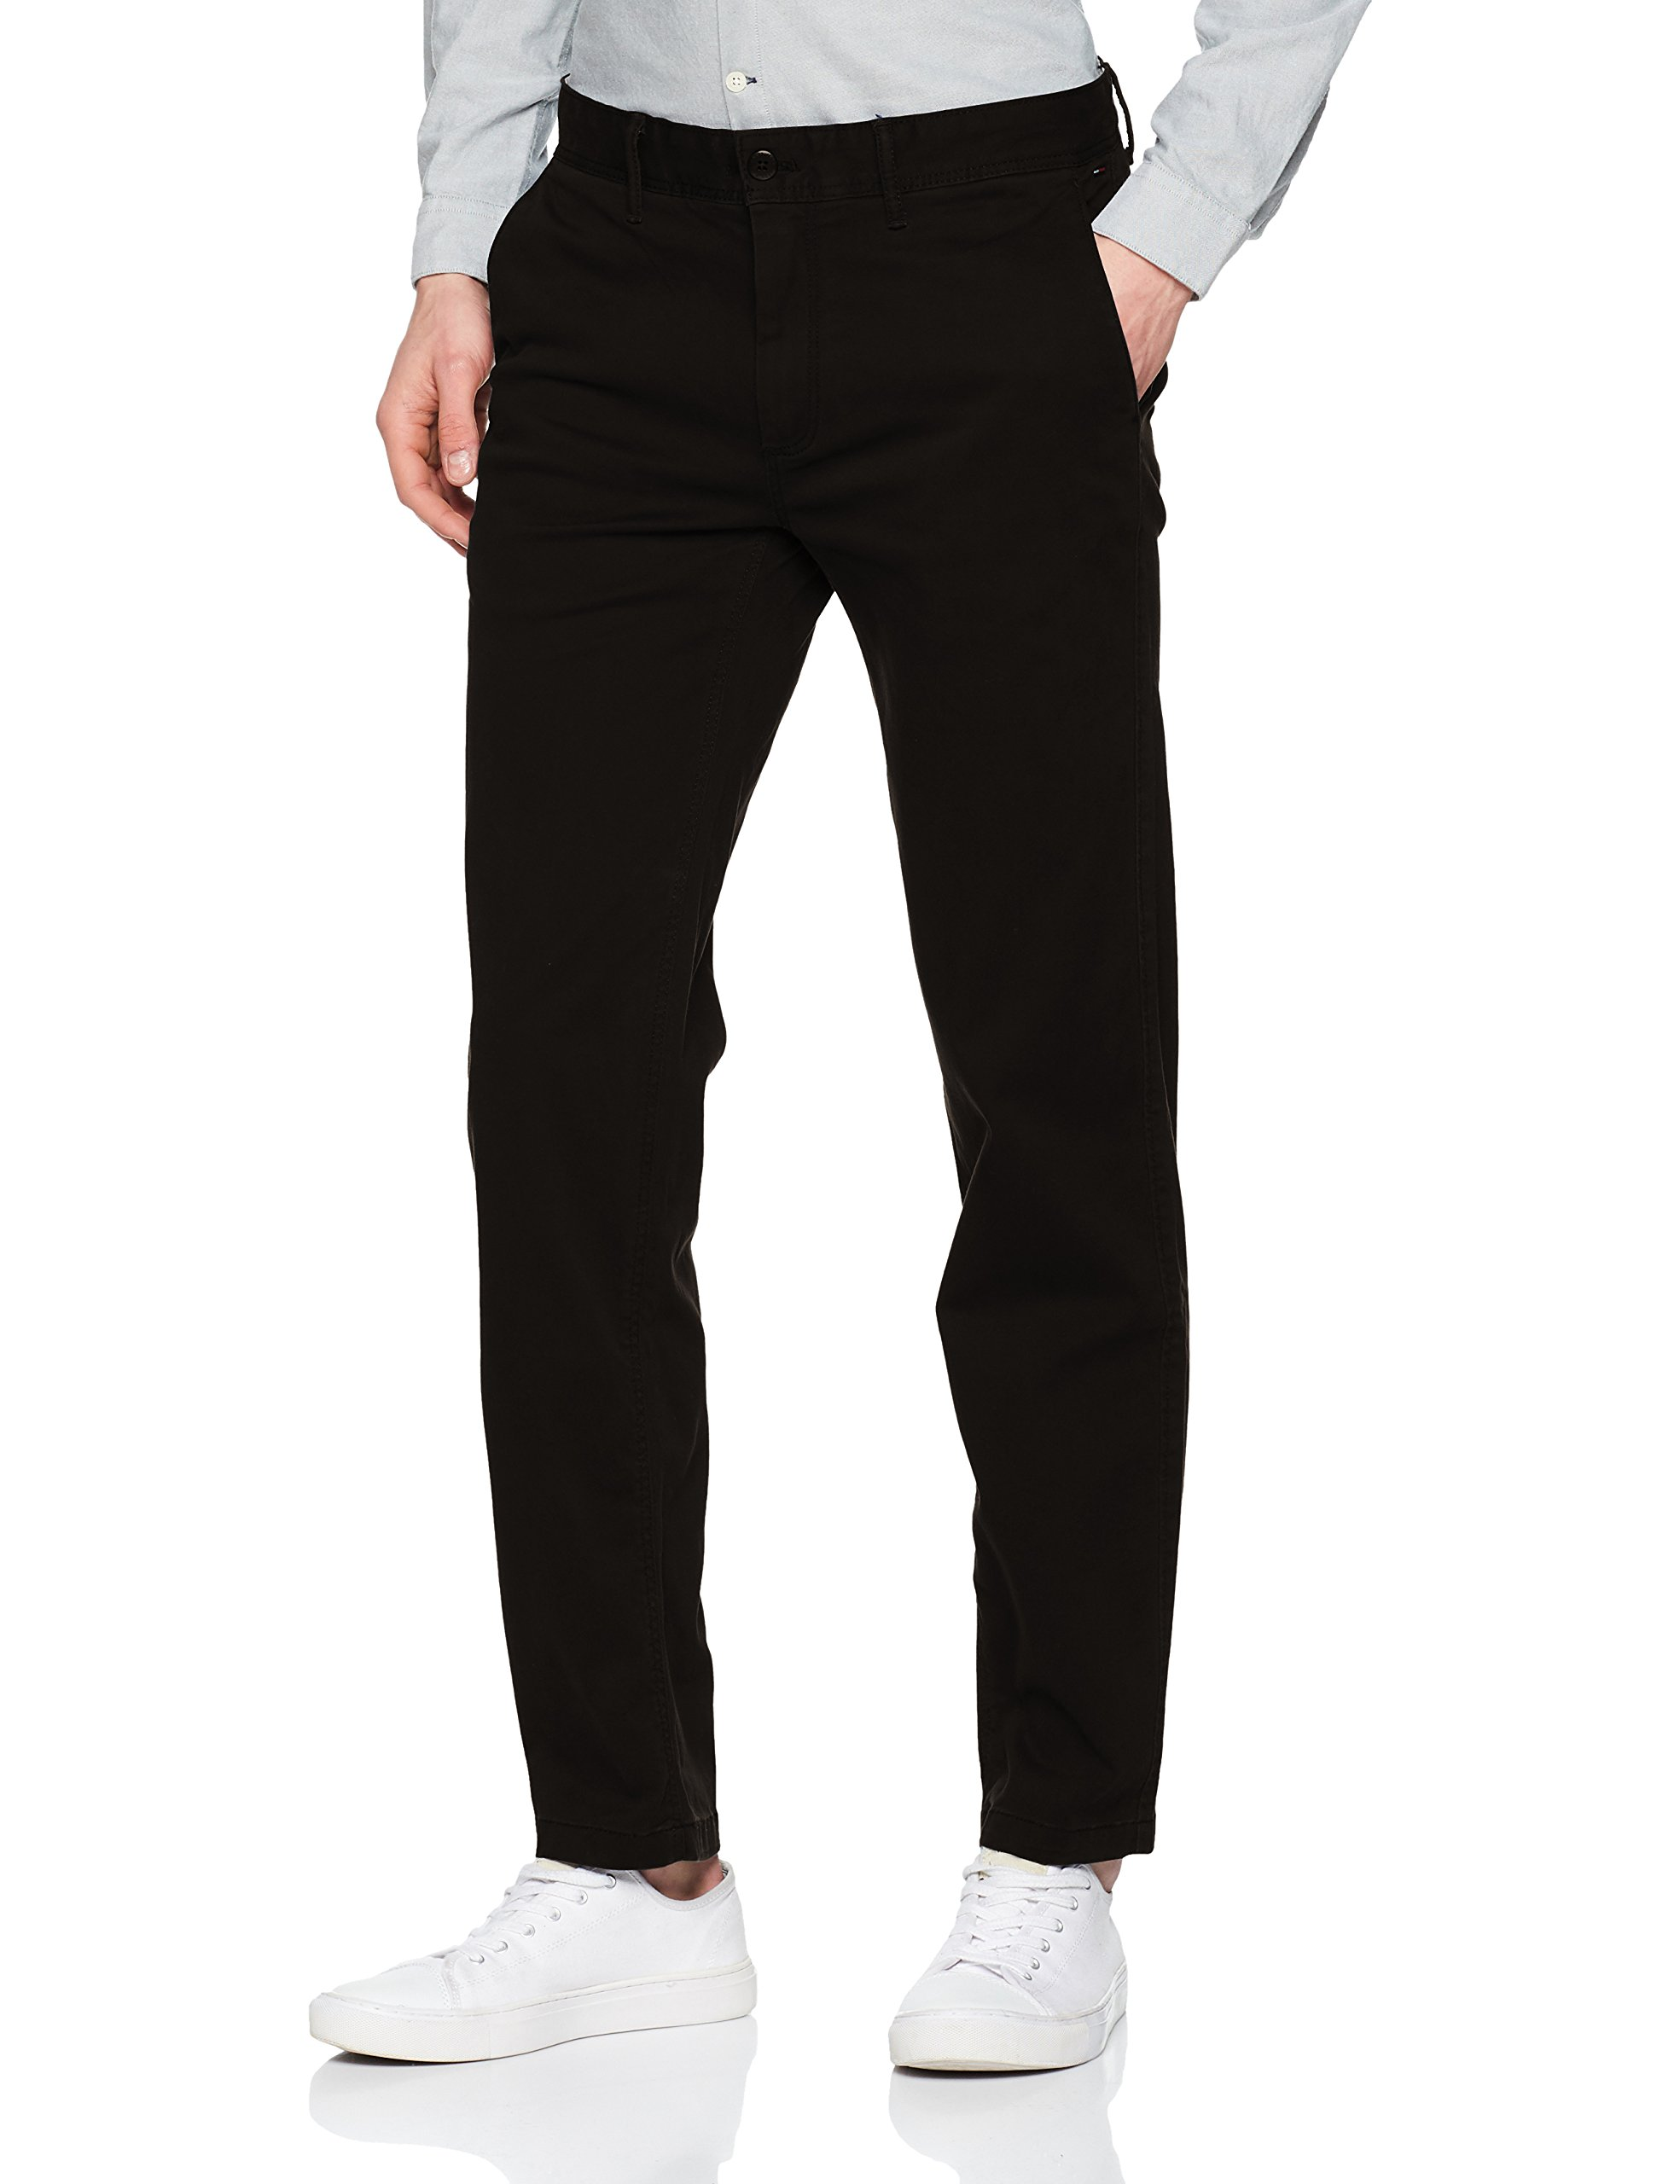 Chino Pantalon Skinny Noirtommy Straight Jeans Homme Black Tommy 078W30 Essential l32 K1JlFc